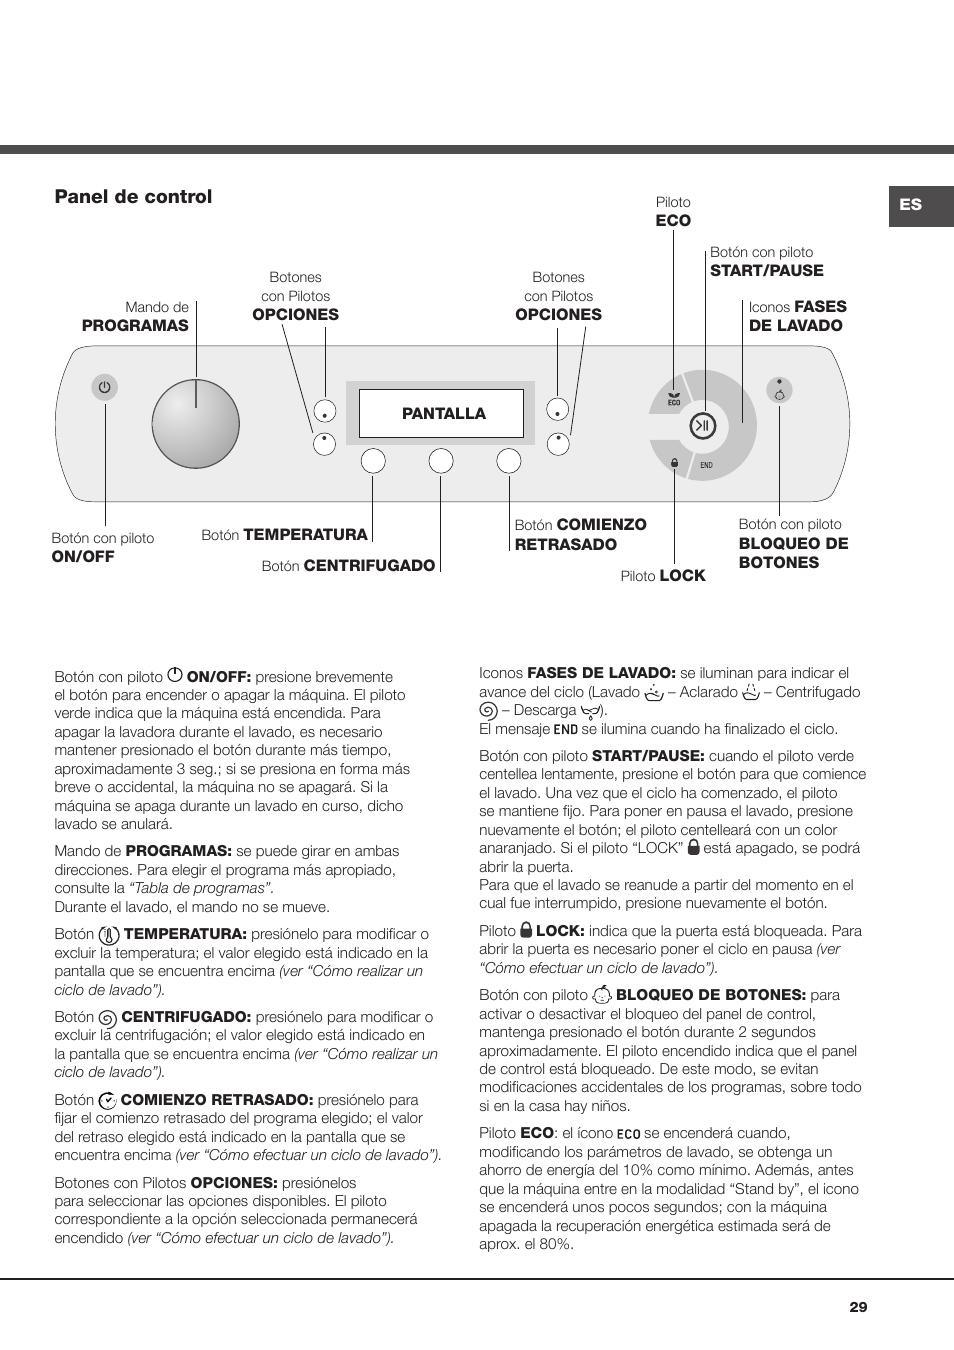 panel de control hotpoint ariston aqualtis aq93f 29x user manual rh manualsdir com hotpoint ariston dishwasher user manual hotpoint ariston oven user manual